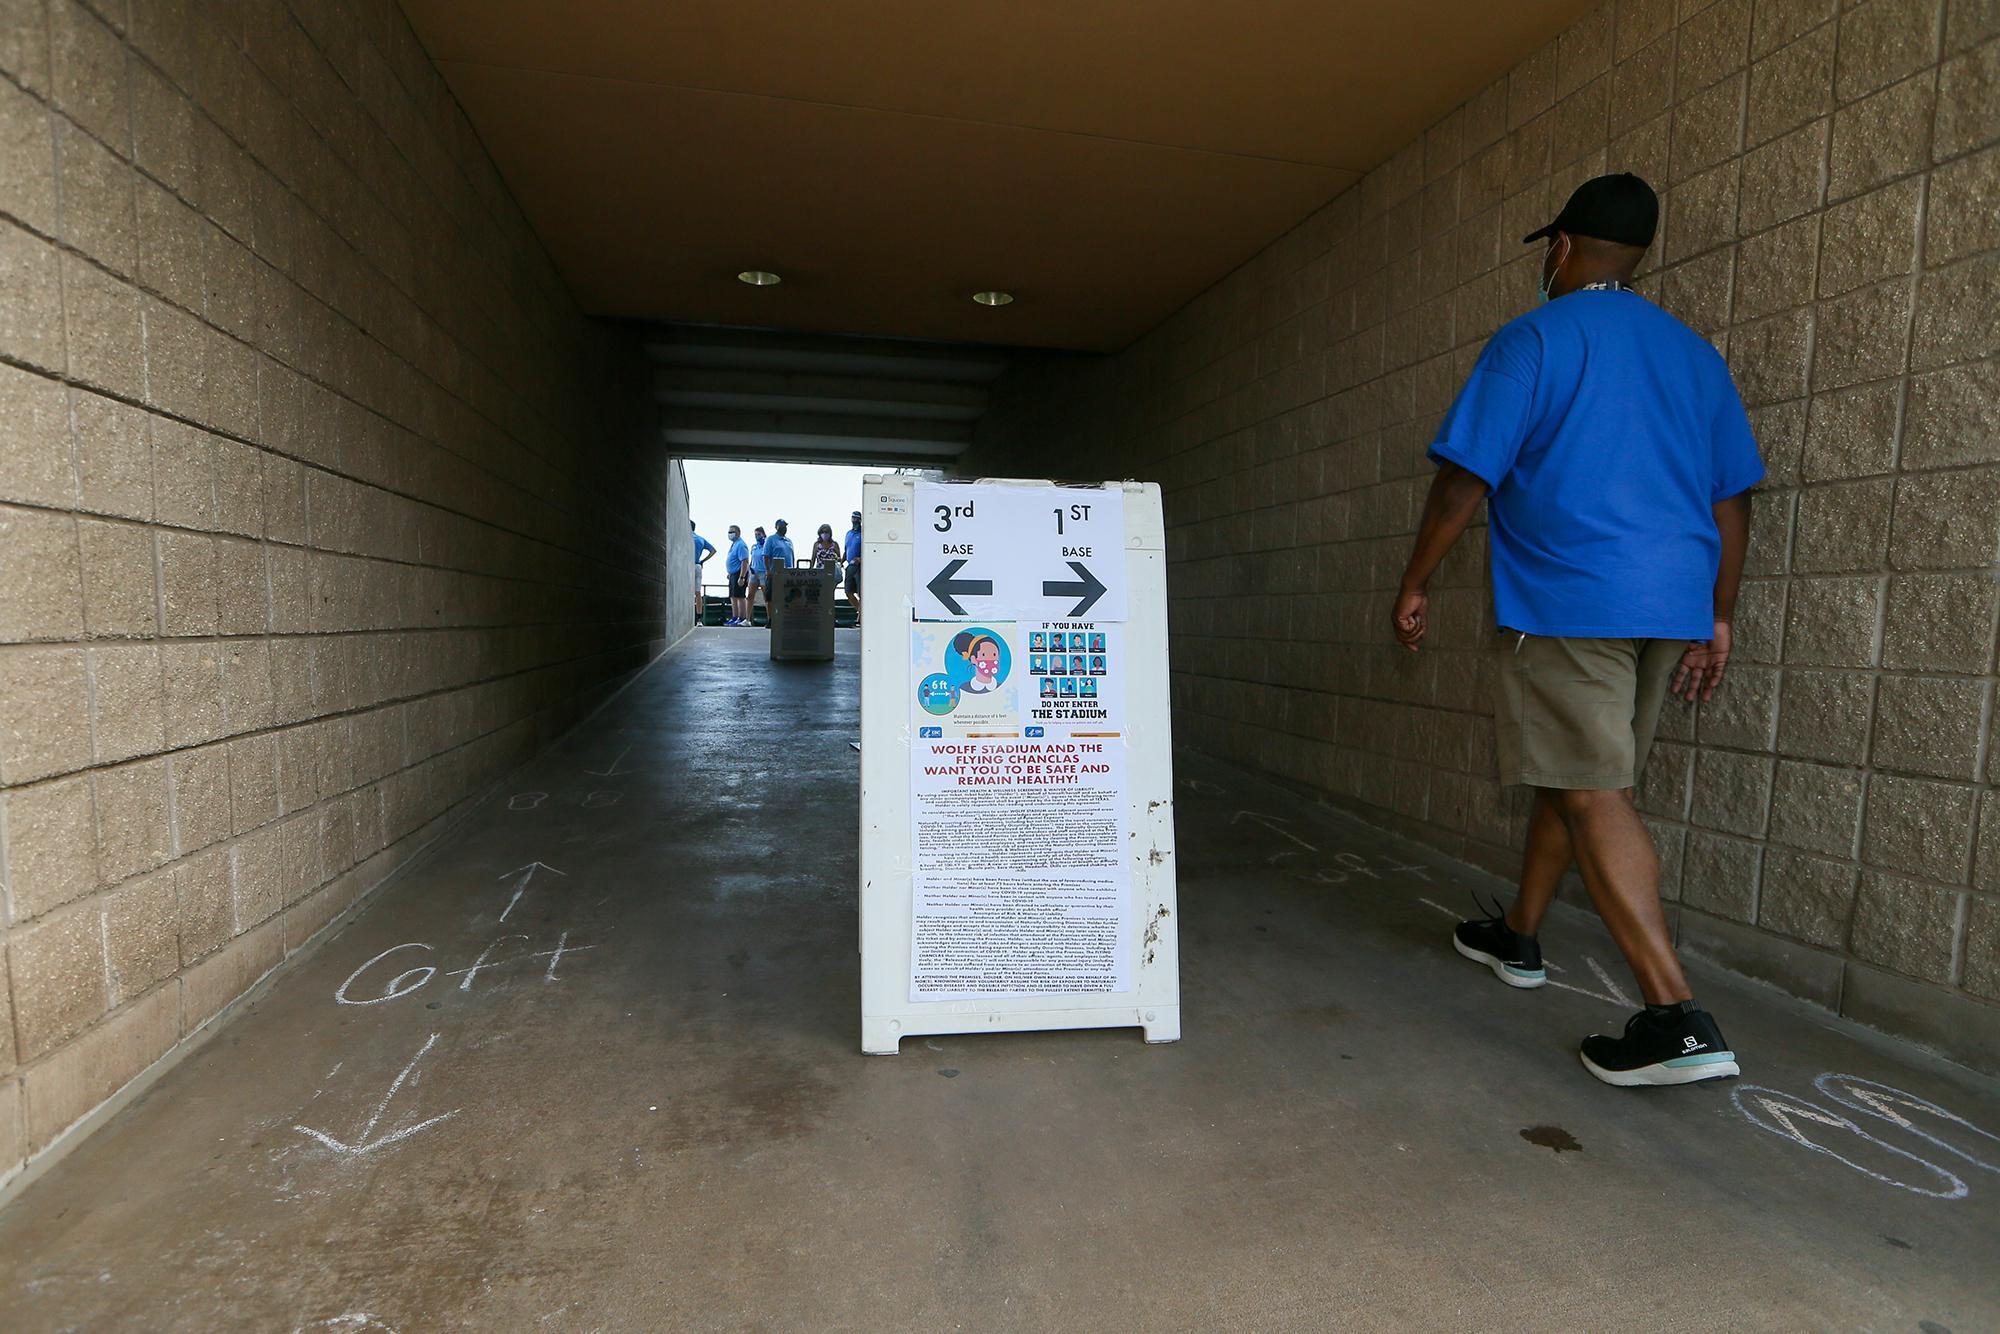 Flying Chanclas' home opener marks baseball's return to Wolff Stadium